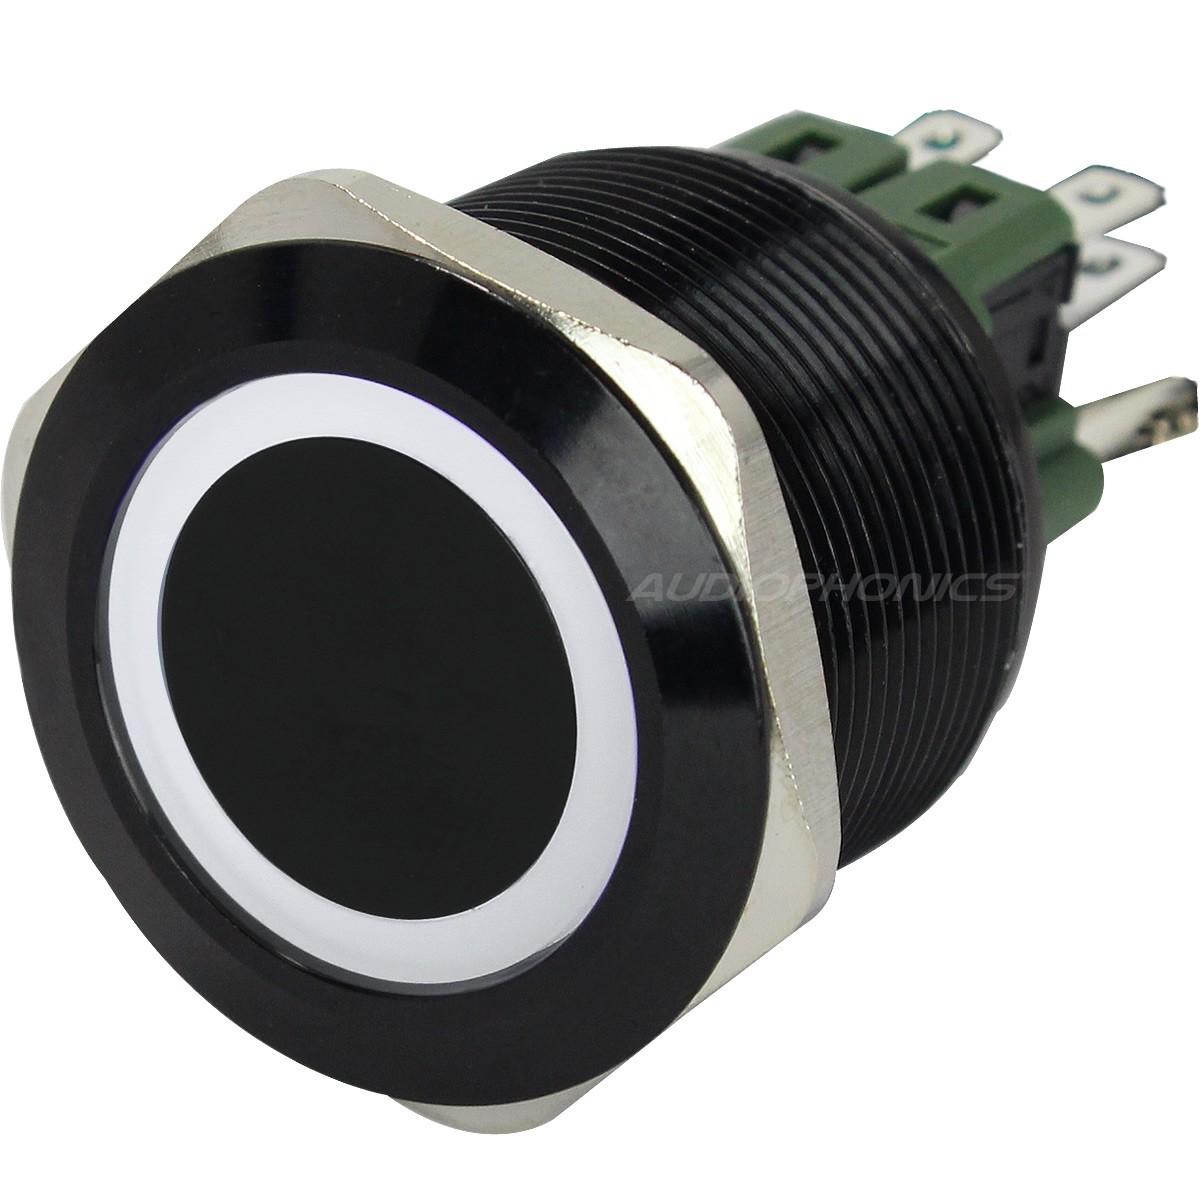 Anodized Aluminium Push Button with White Circle Light 1NO1NC 250V 5A Ø25mm Black